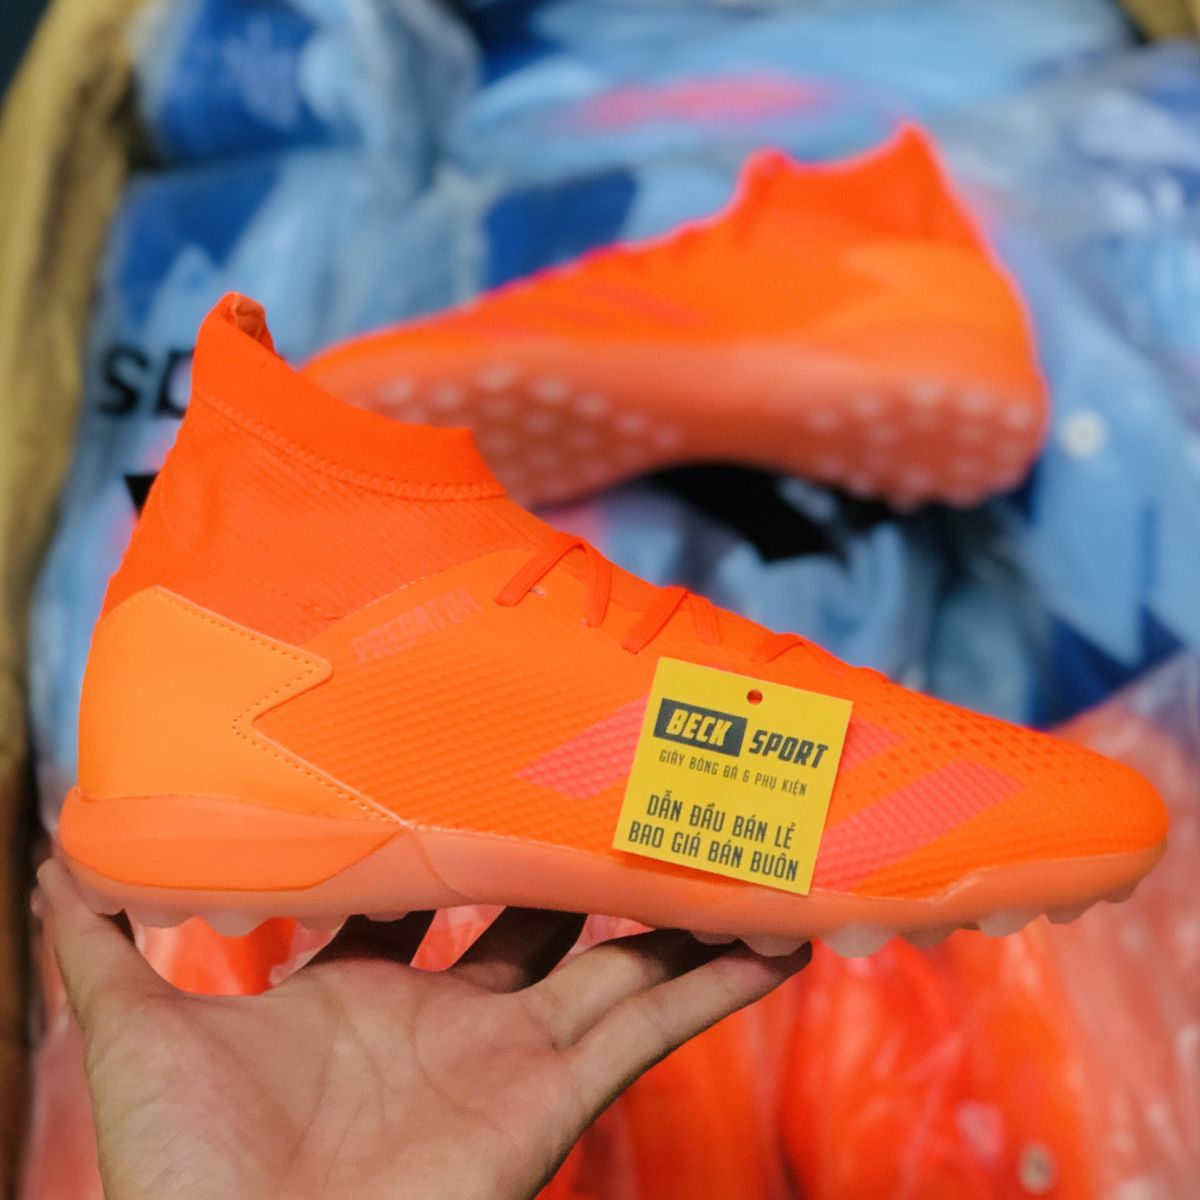 Giày Bóng Đá Adidas Predator 20.3 Locality Đỏ Cam Cổ Cao HQ TF